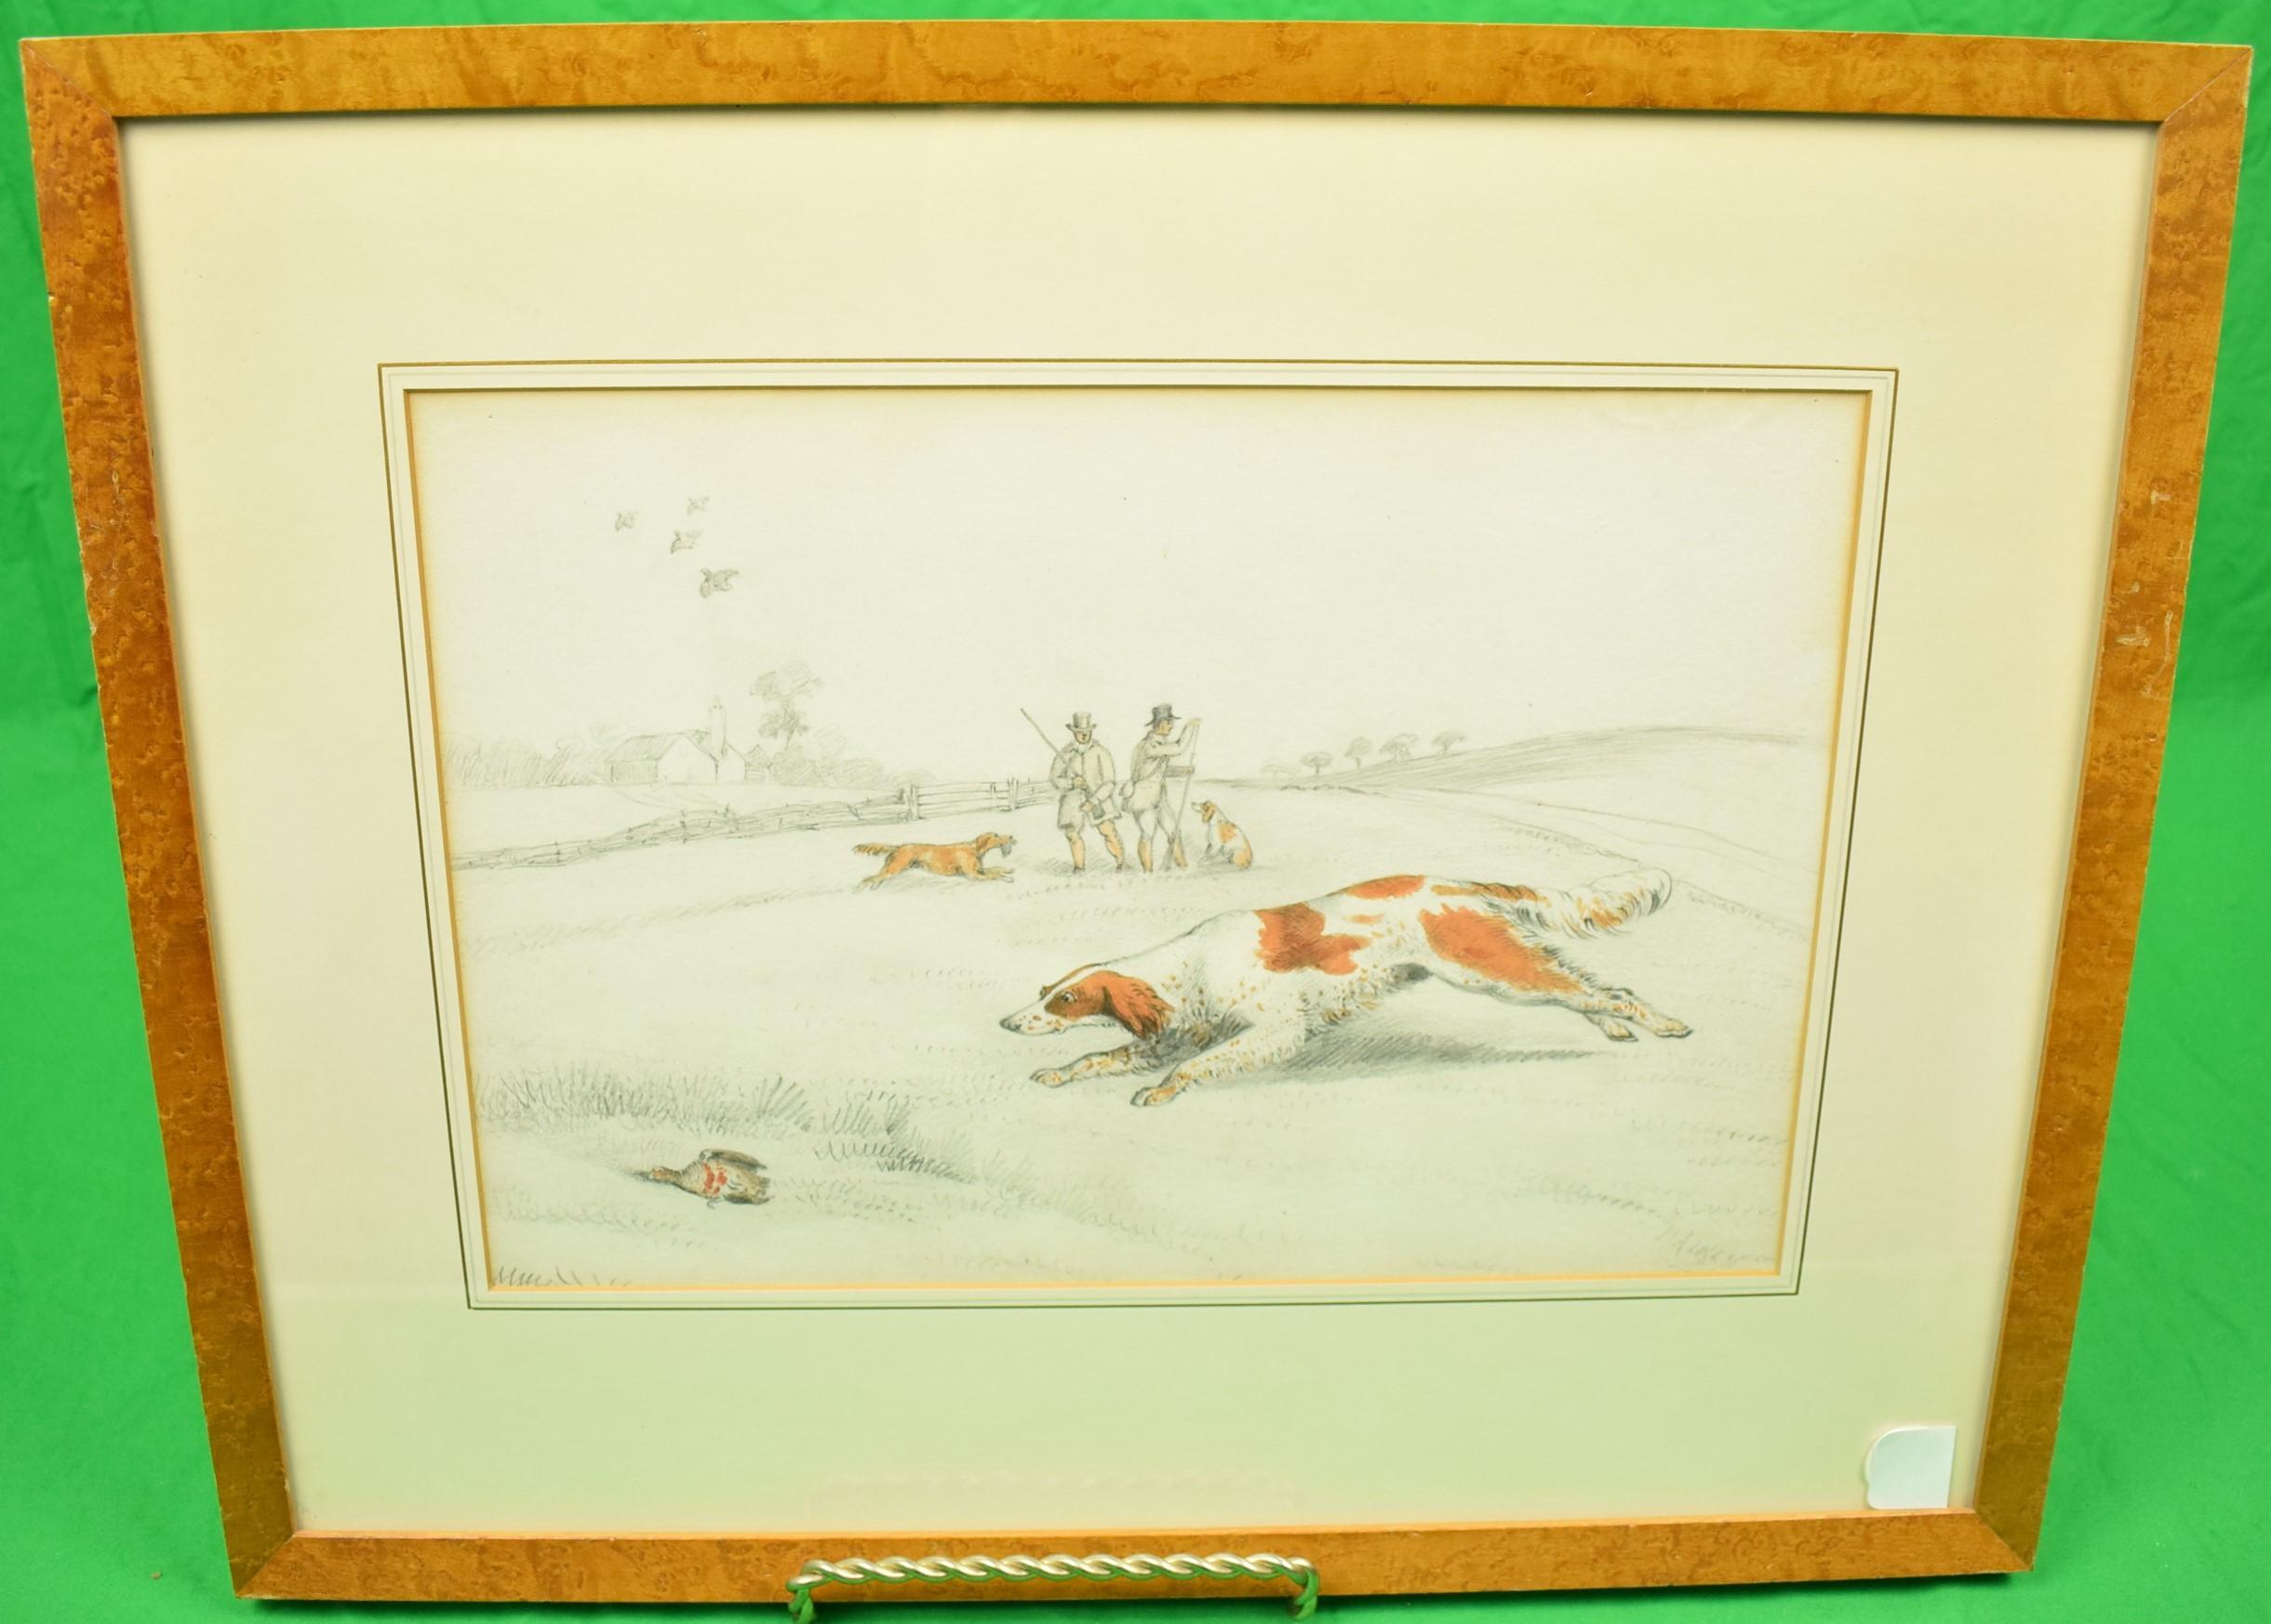 """Two Huntsmen Quail Shooting in a Field"" Drawing by Henry Alken"